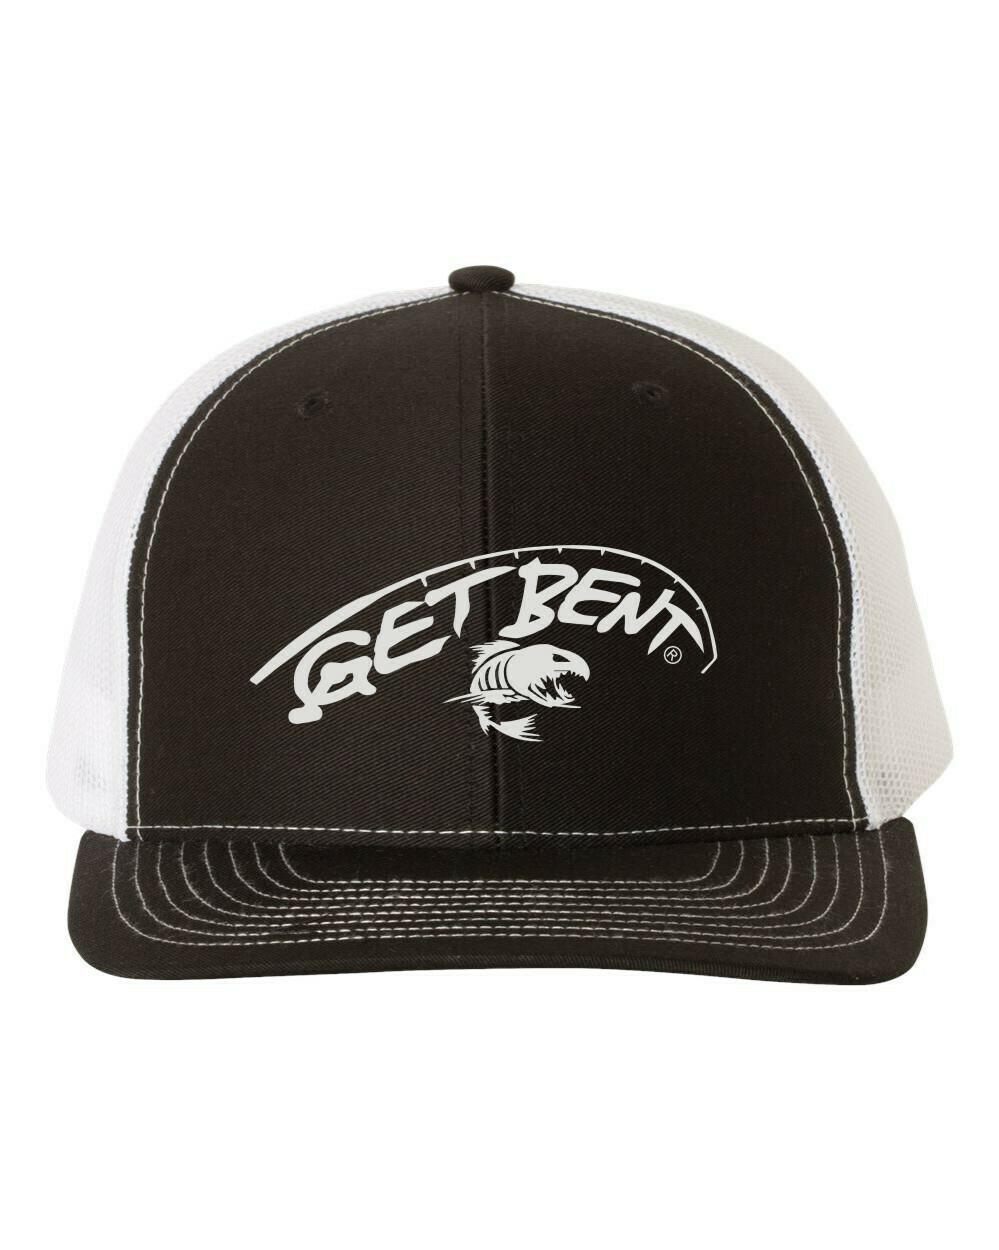 'Get Bent' - Richardson Trucker - Black/White